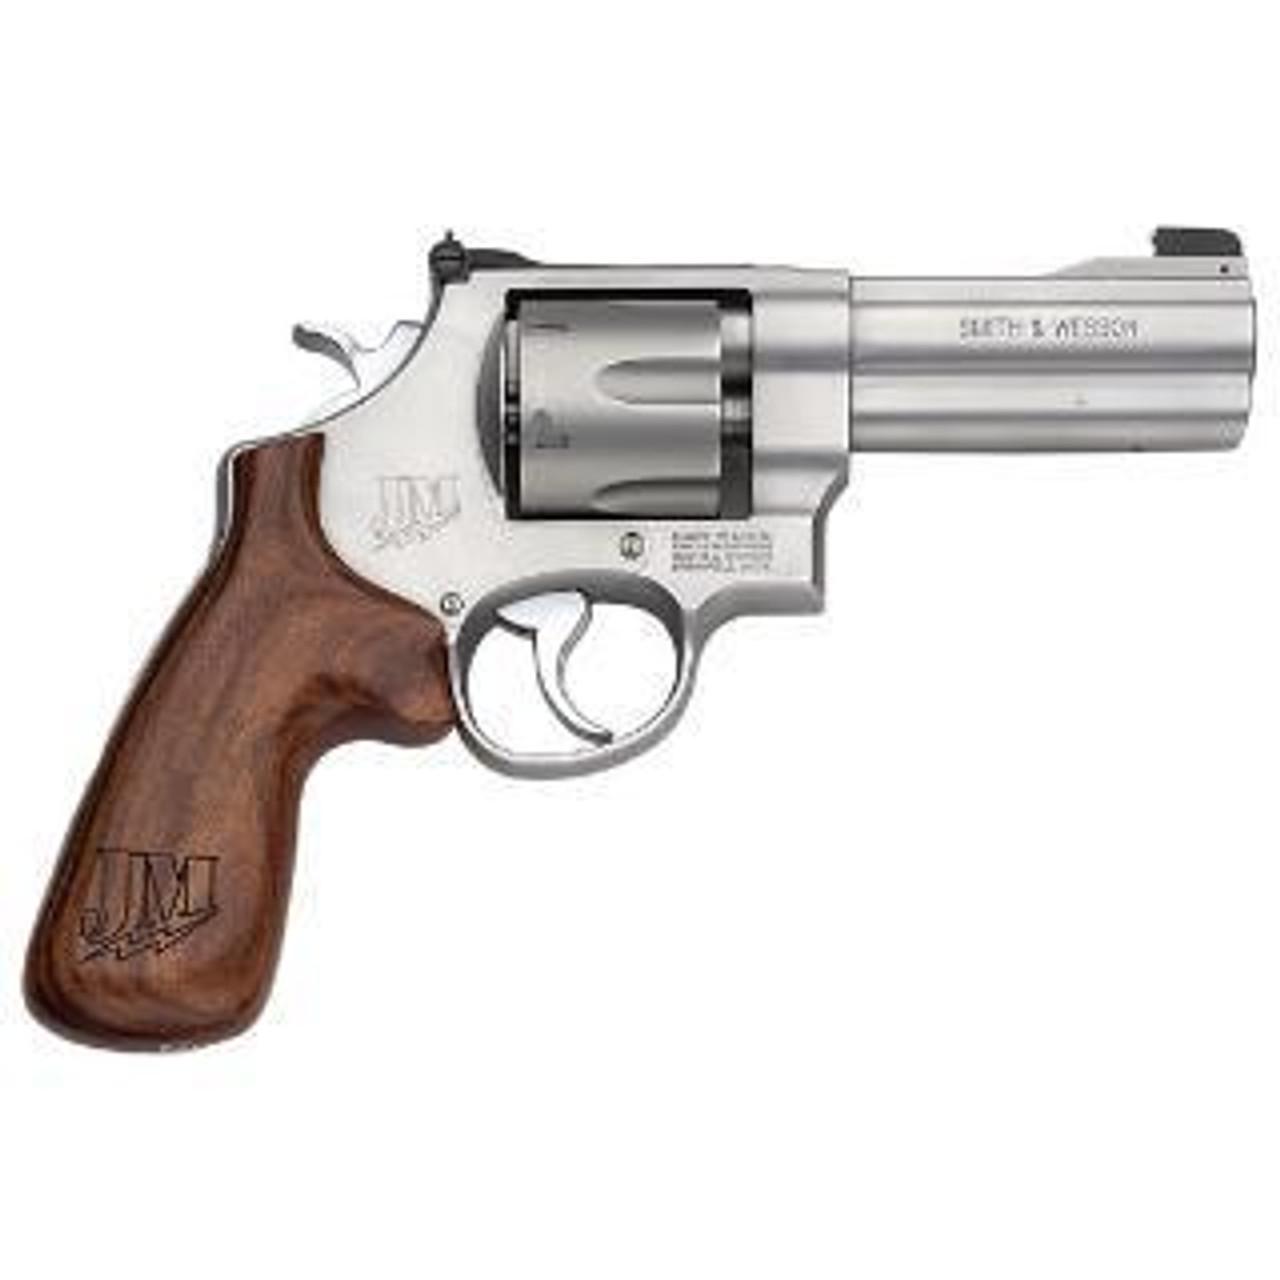 Smith & Wesson 625 JM CALIFORNIA LEGAL - .45 ACP